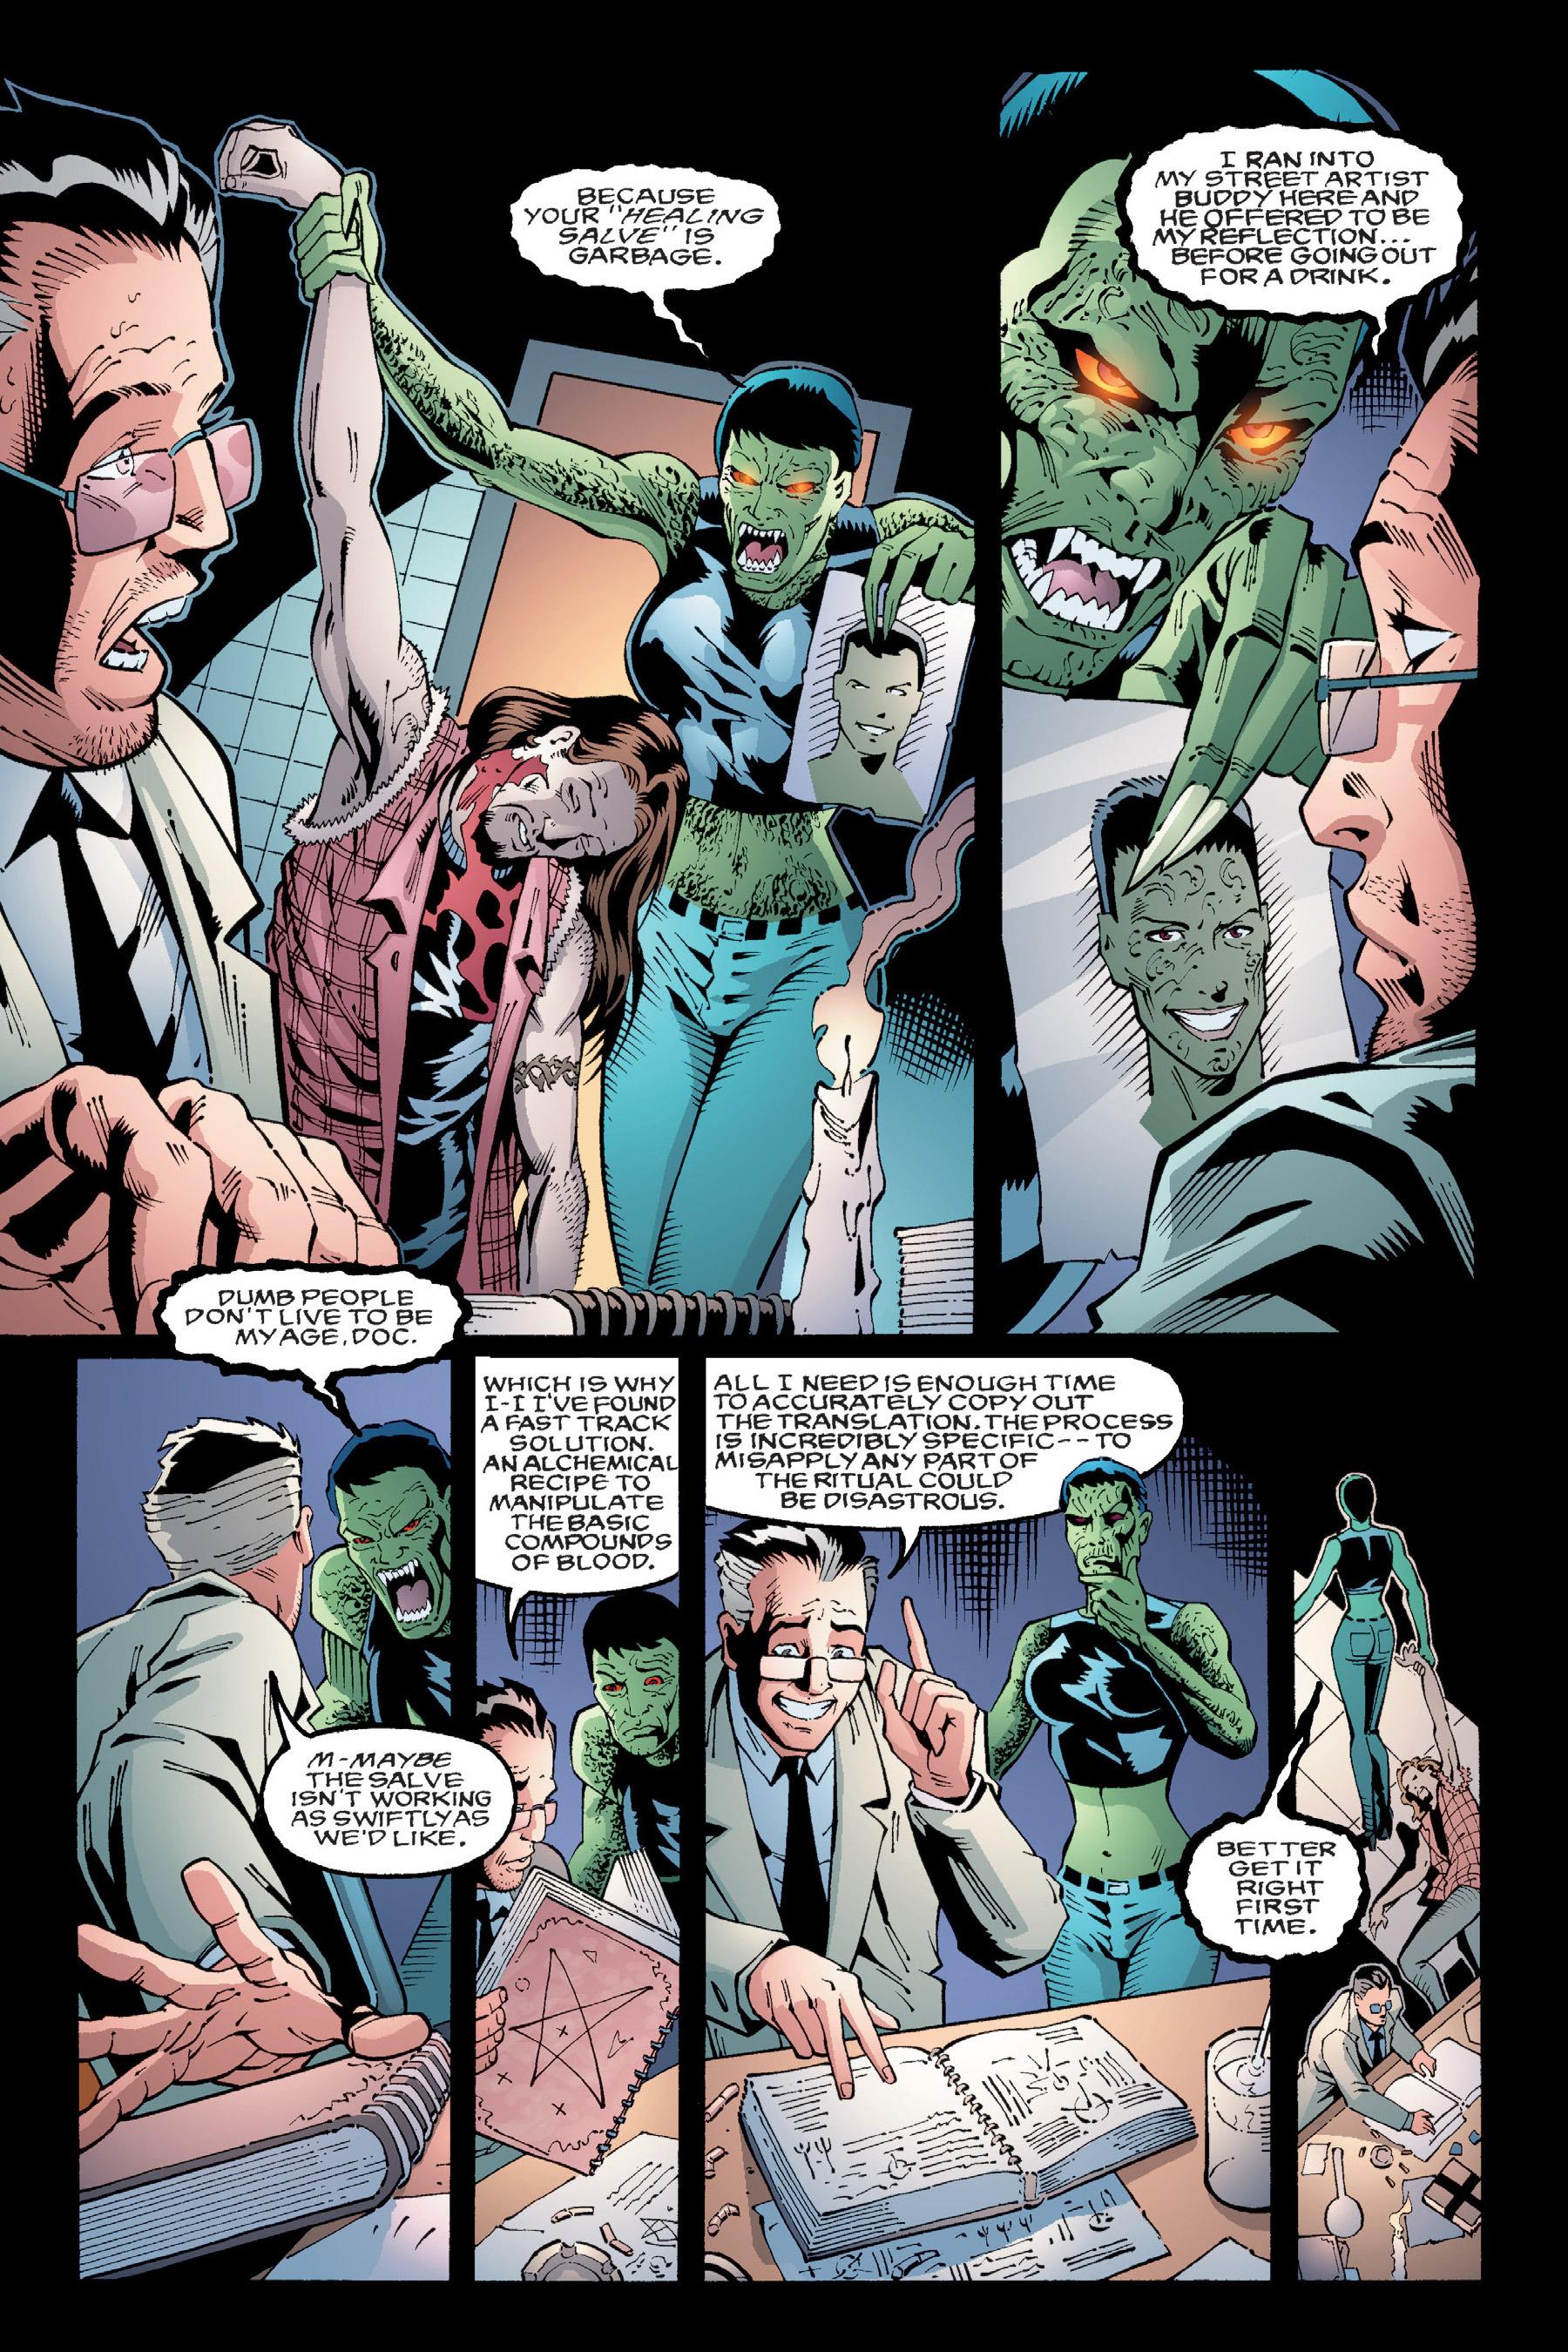 Read online Buffy the Vampire Slayer: Omnibus comic -  Issue # TPB 4 - 55